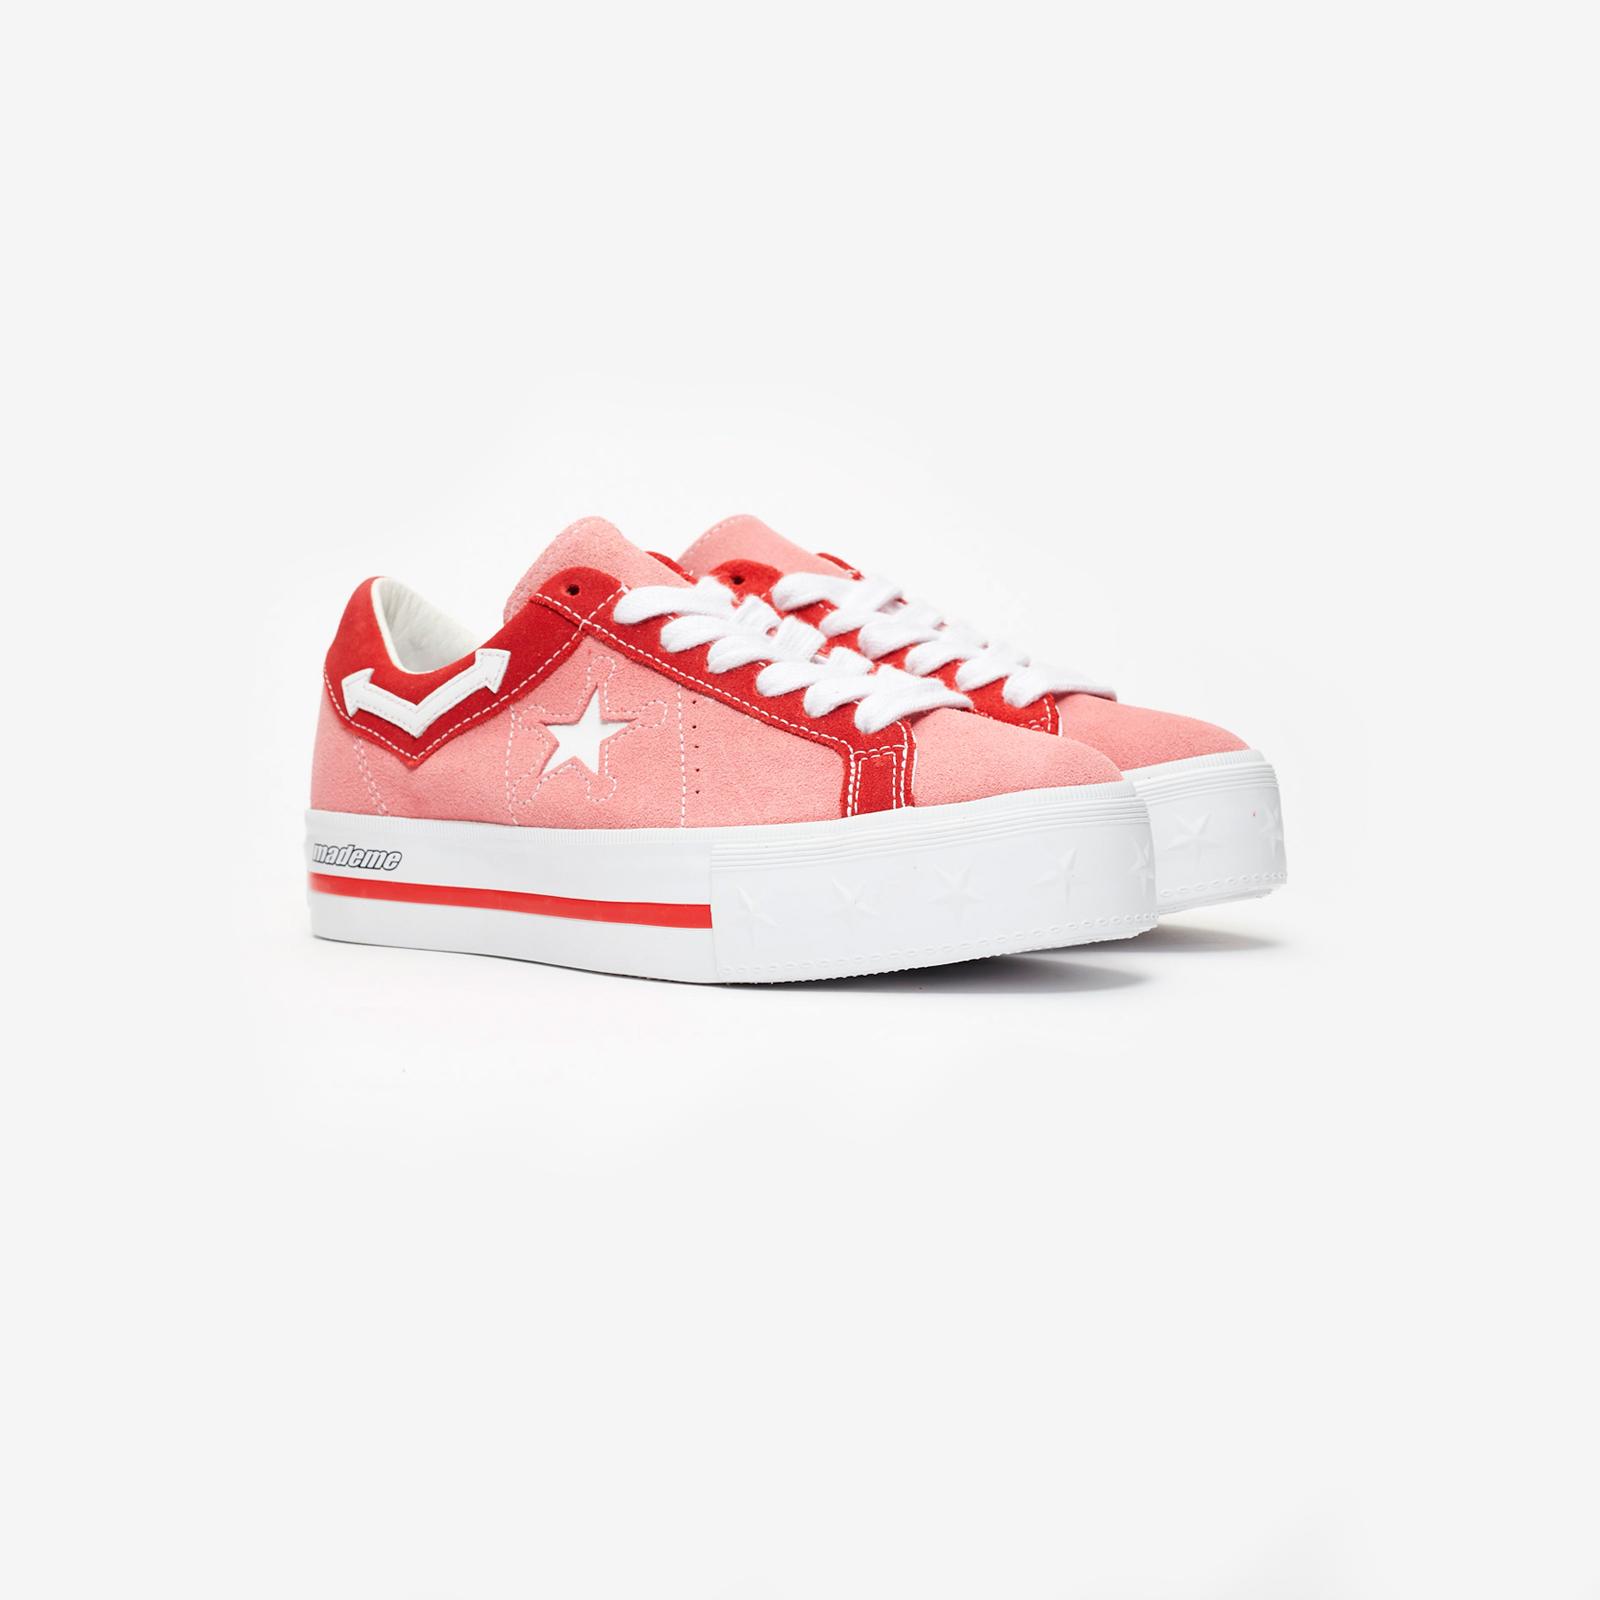 f91becff6d98 Converse One Star Platform x MadeMe - 563730c - Sneakersnstuff I ...